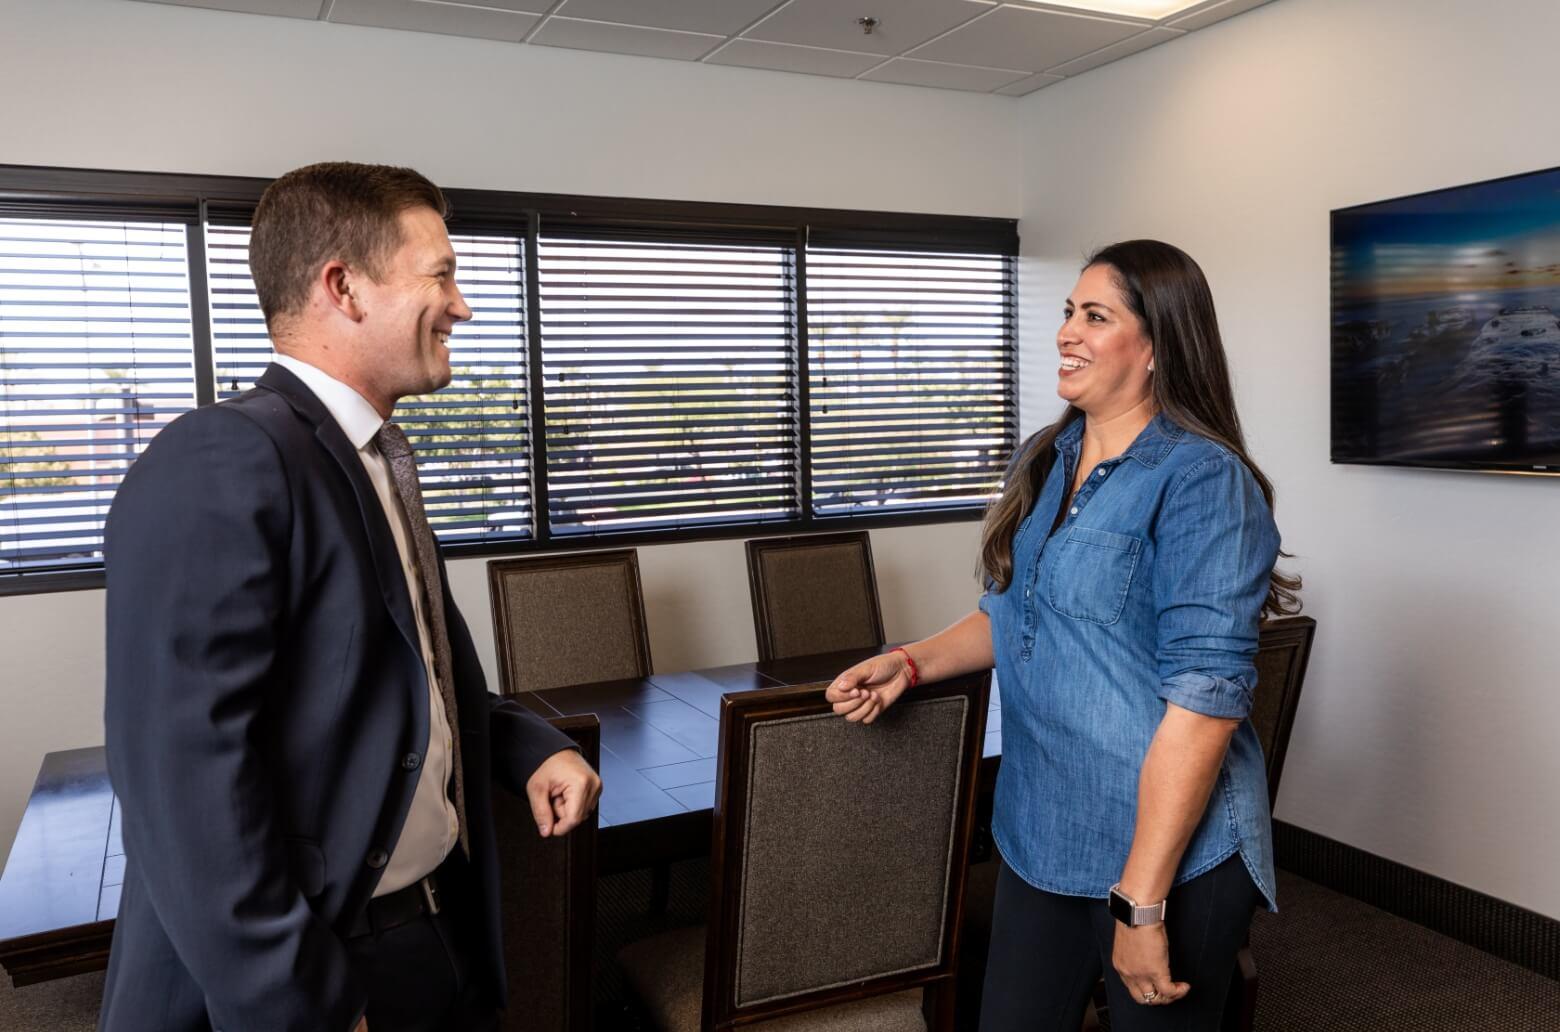 Chase Rasmussen, Arizona Personal Injury Lawyer